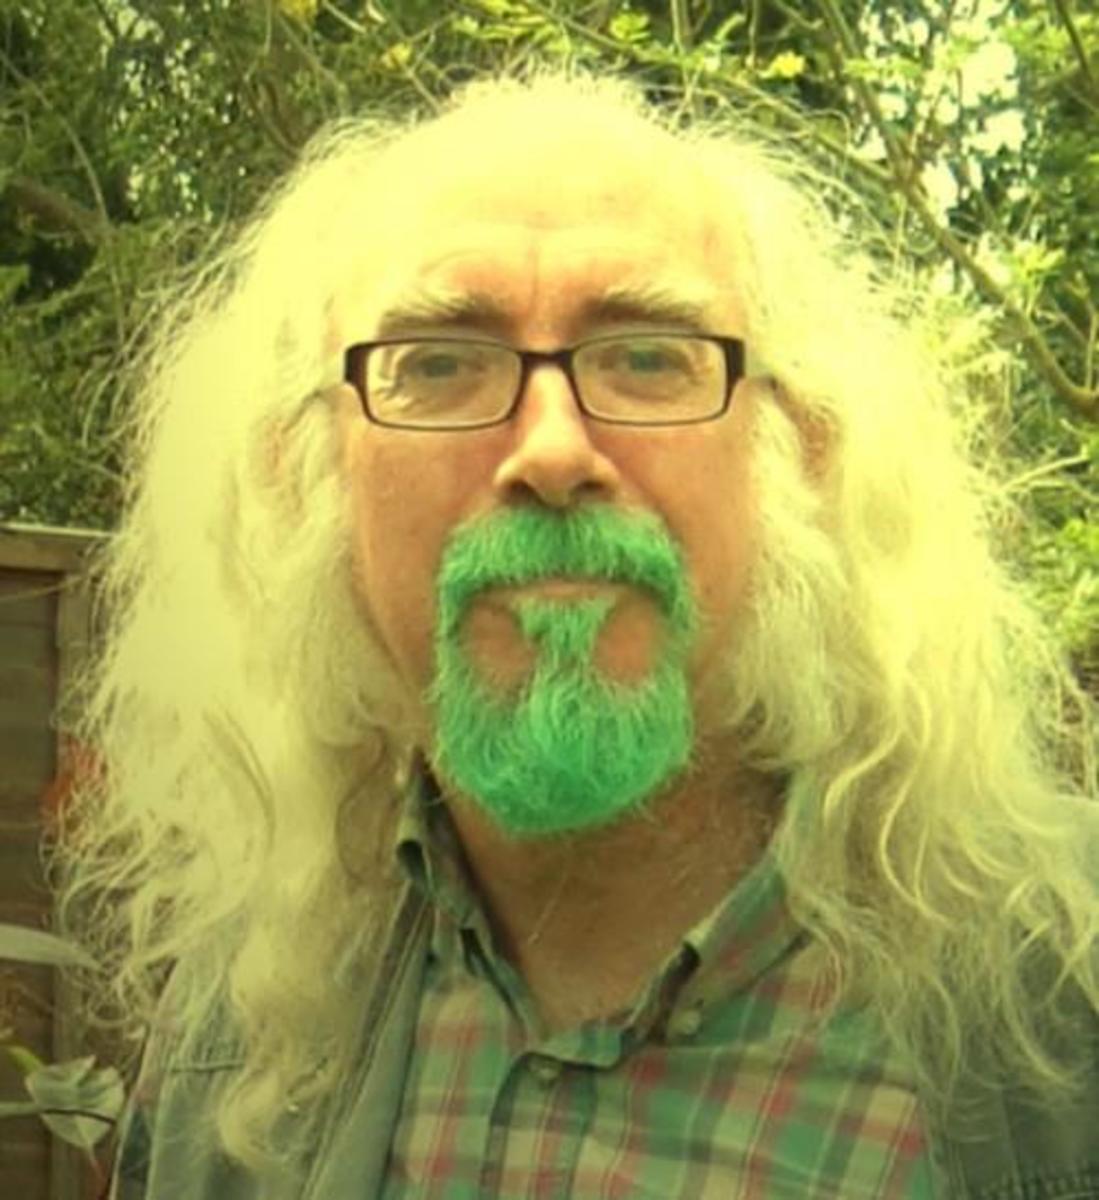 Green Beard and snow white hair